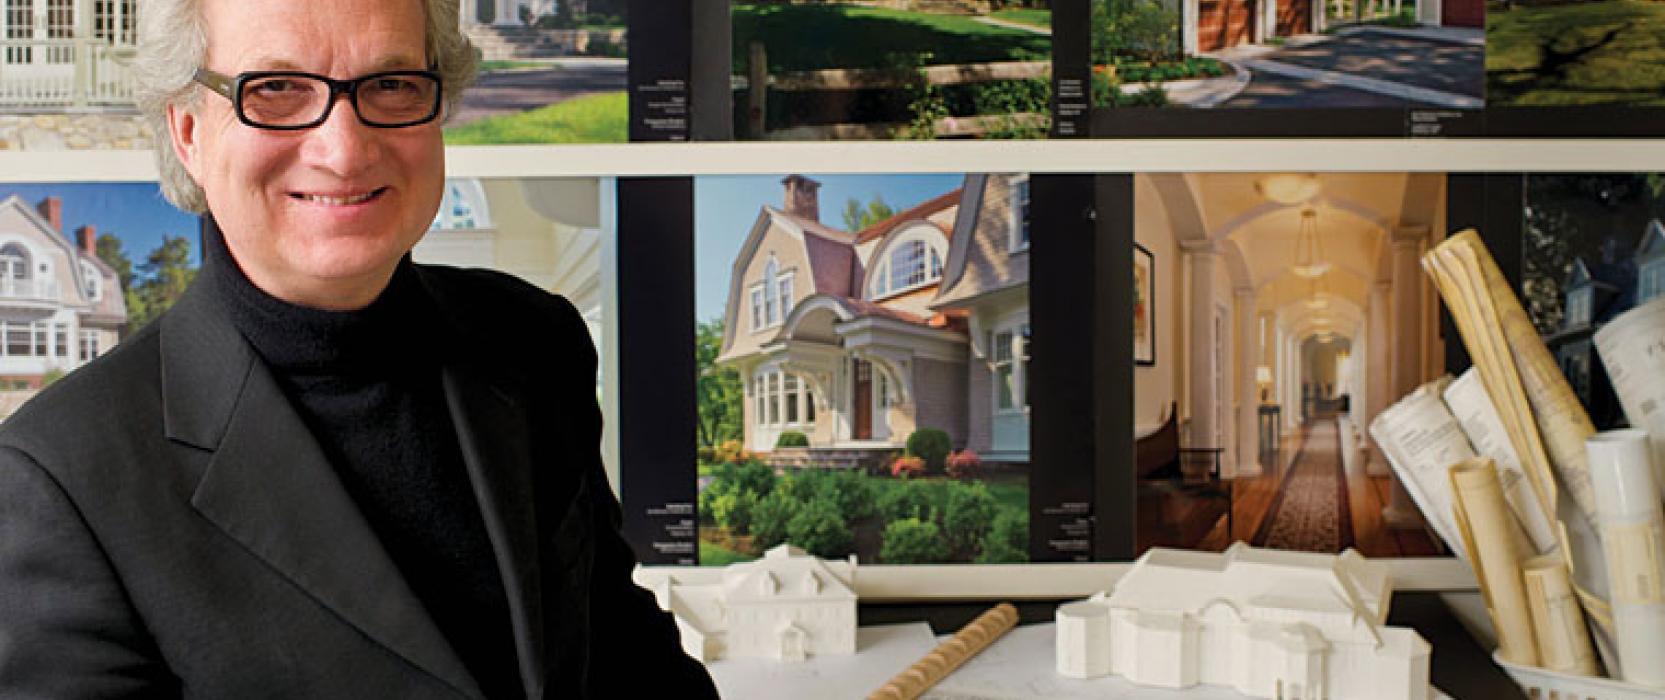 Jan Gleysteen of Jan Gleysteen Architects, Inc.